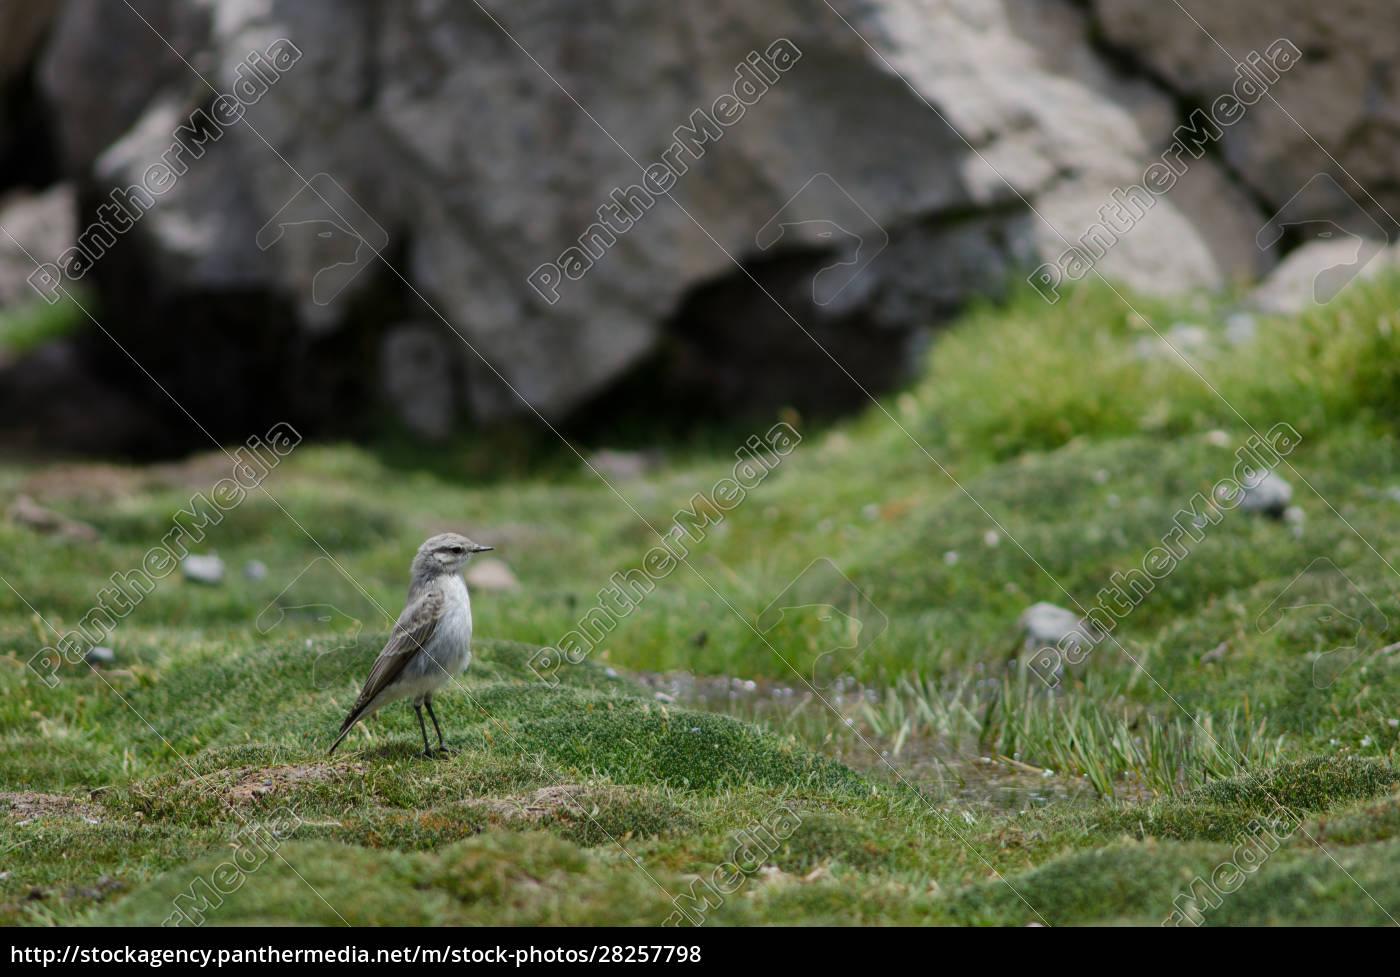 puna, ground, tyrant, muscisaxicola, juninensis, in - 28257798